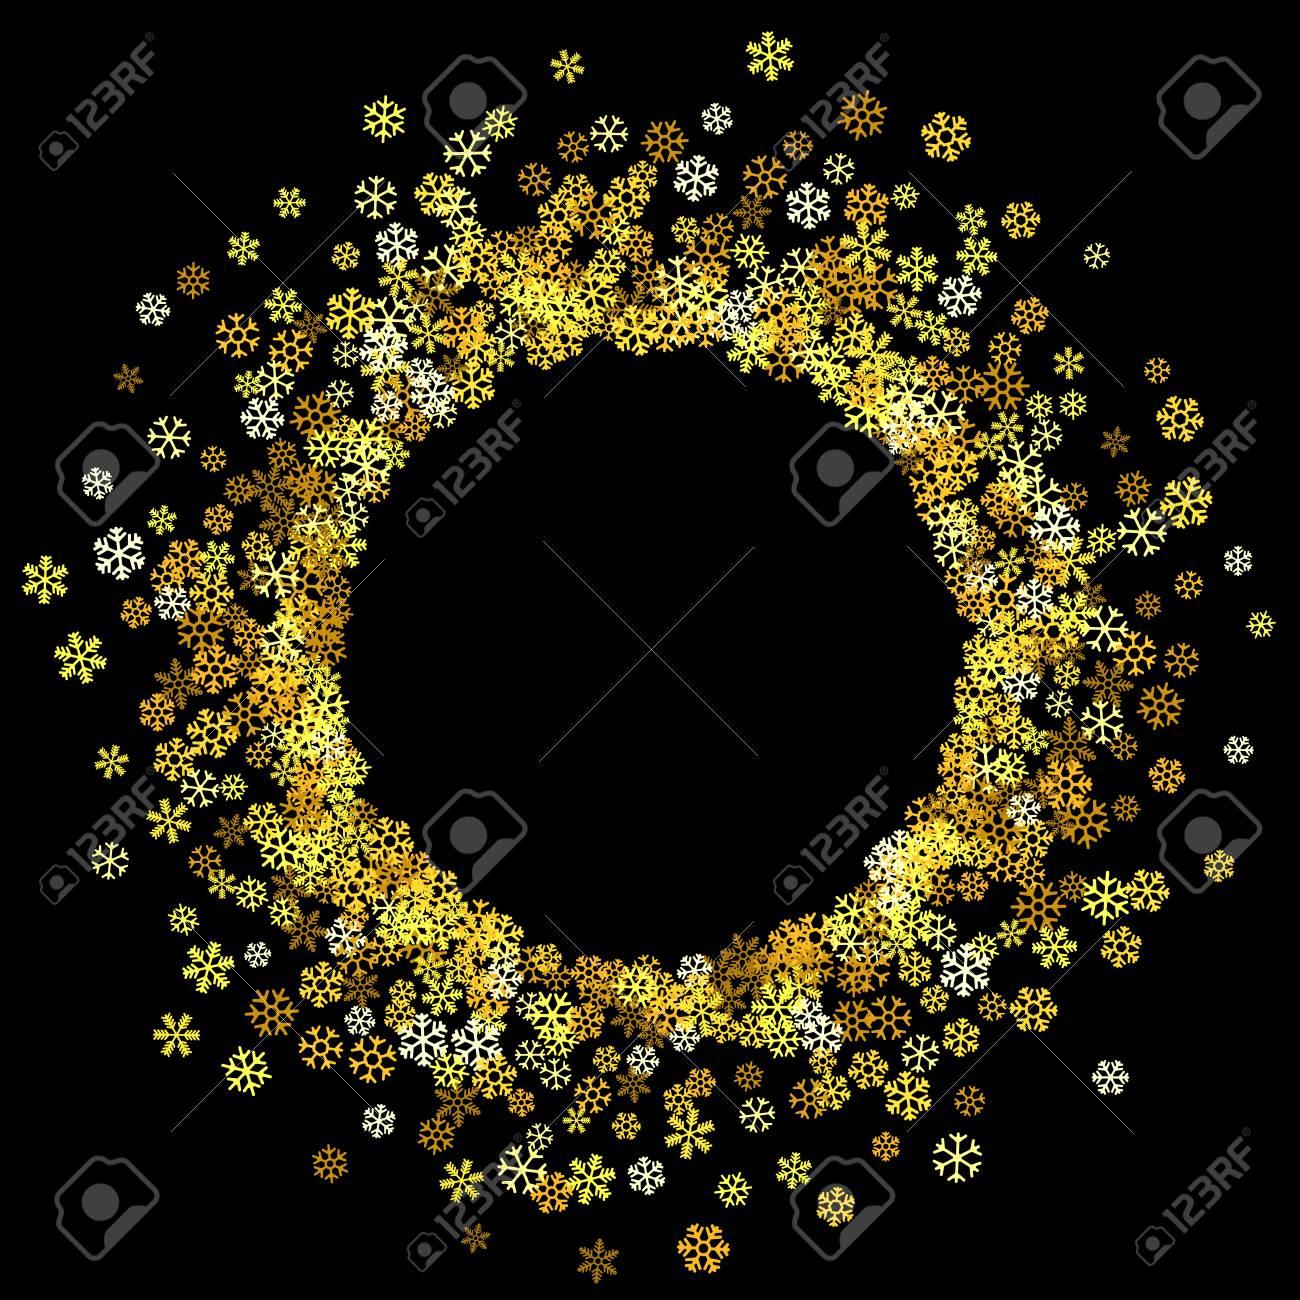 fd9405865a7 Round gold frame or border of random scatter golden snowflakes on black  background. Design element